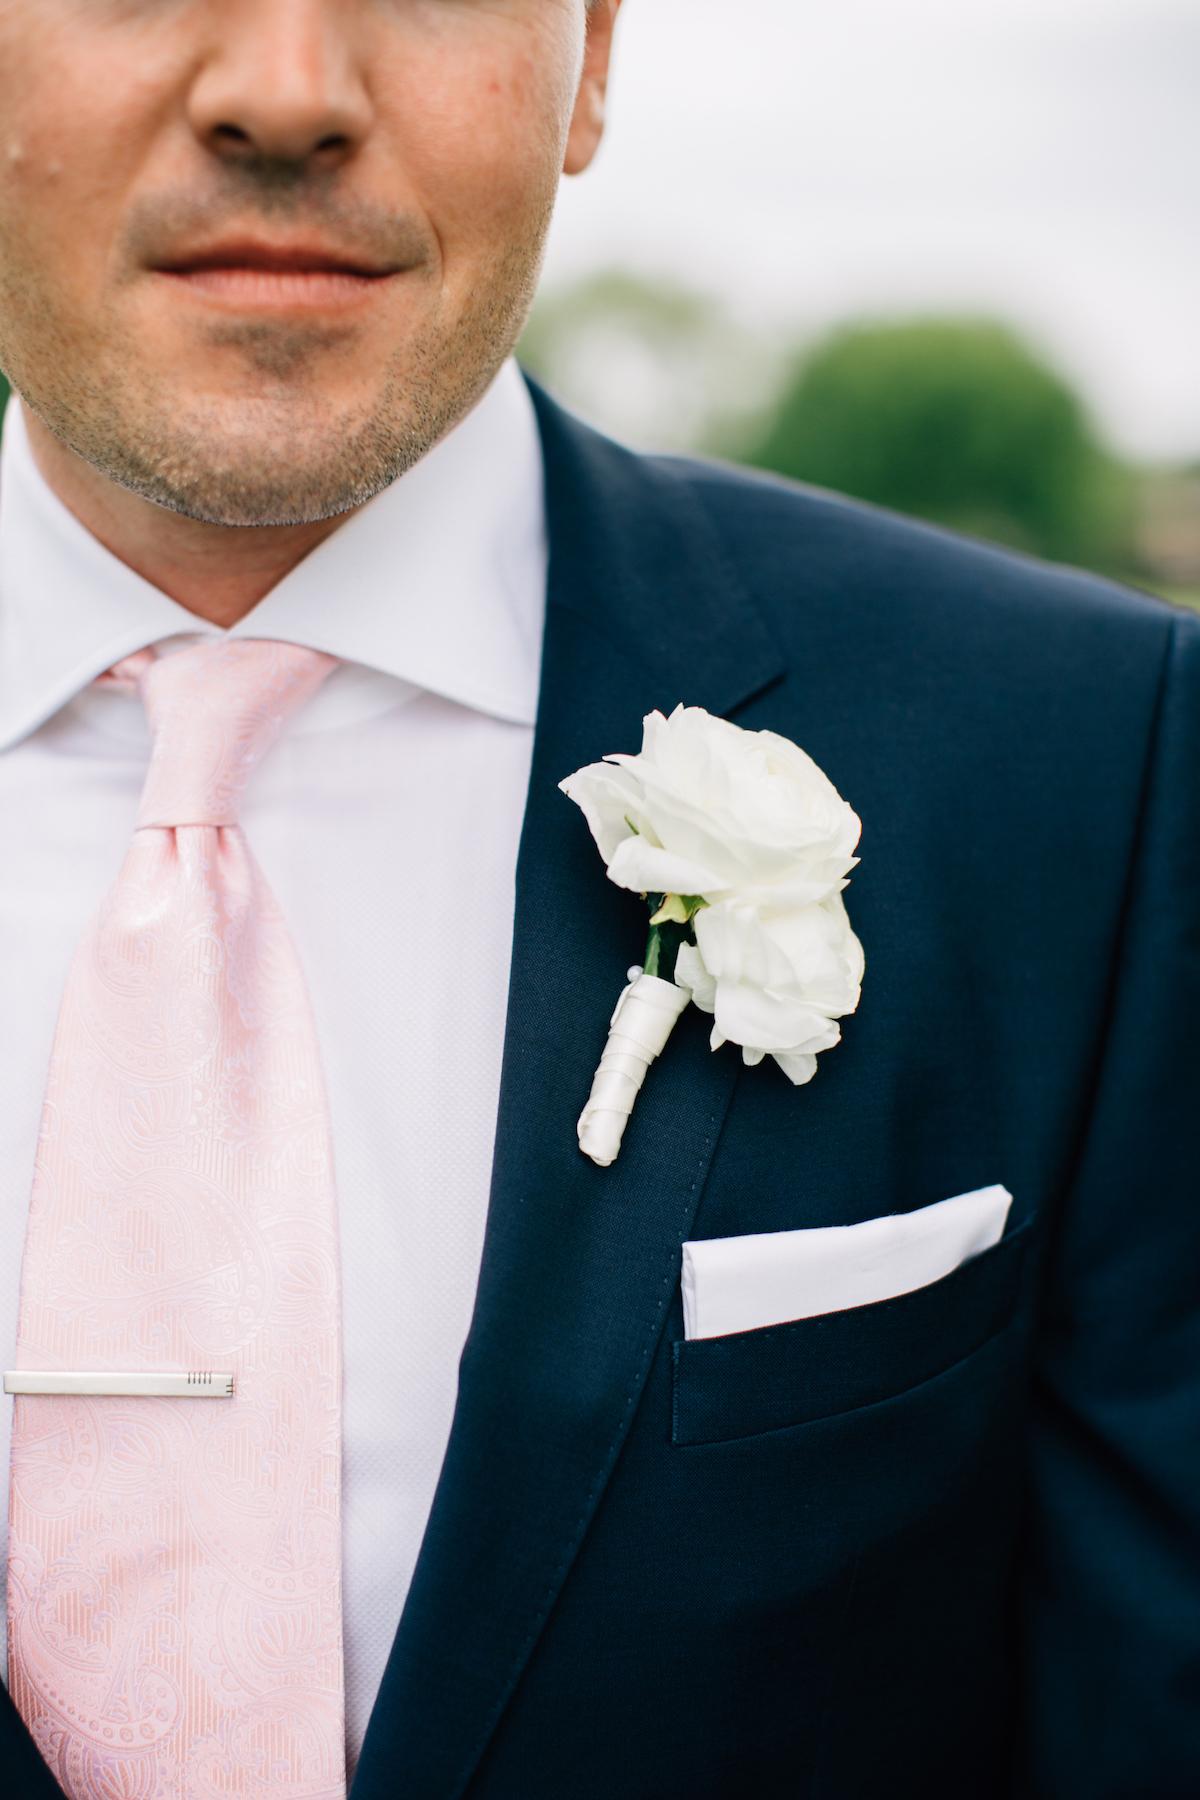 engle-olson-mark-fierst-minnesota-wedding-11.jpg